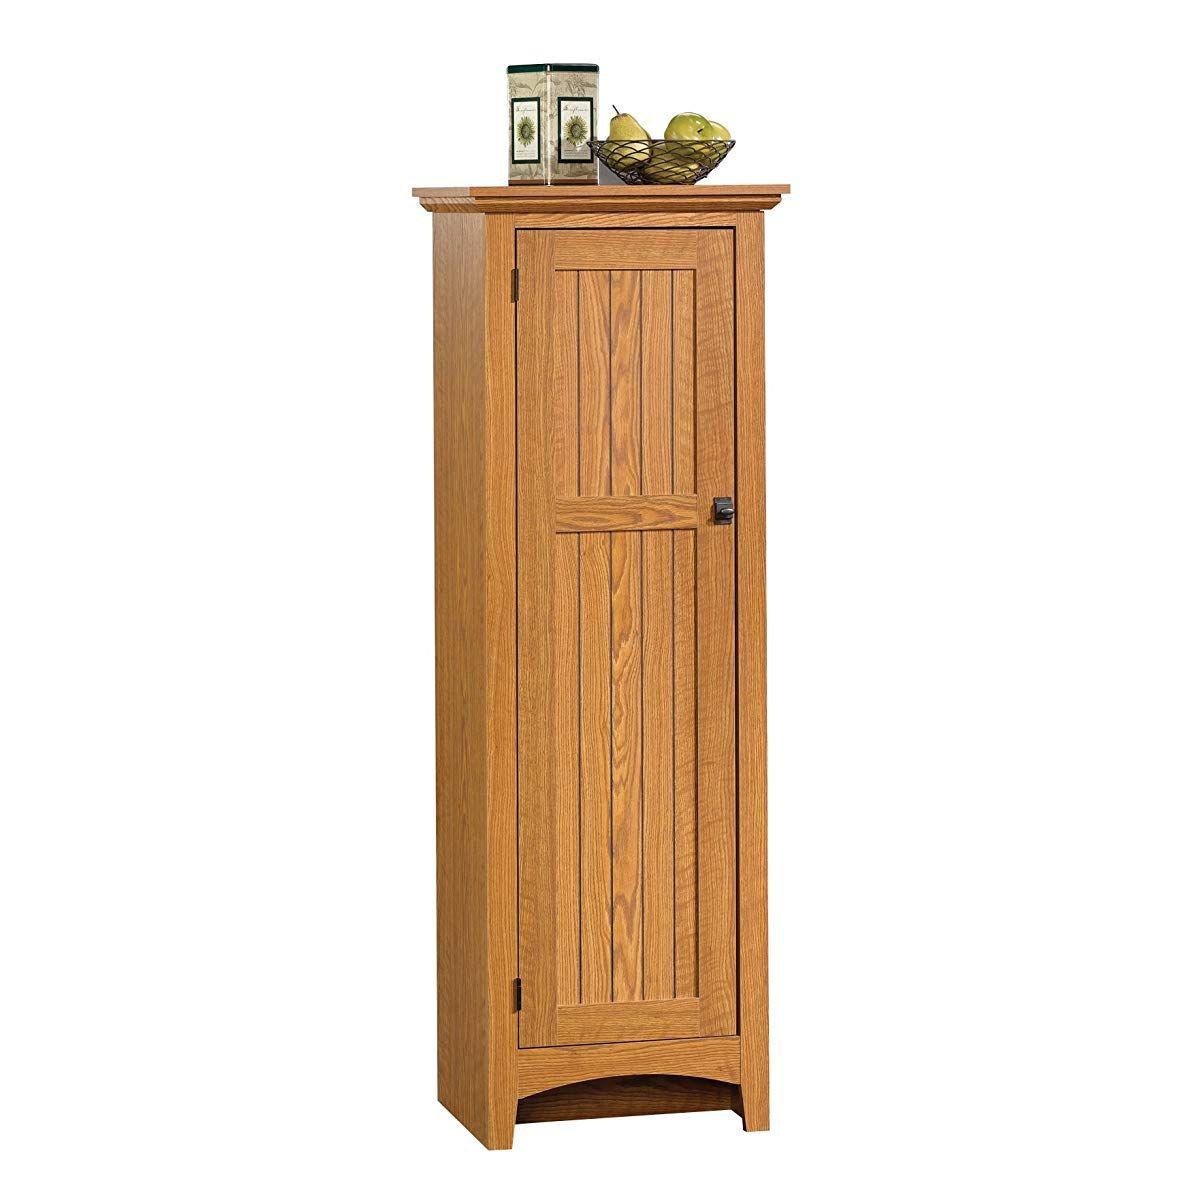 Sauder Summer Home Pantry Carolina Oak Finish Pantry Cabinet Pantry Storage Cabinet Sauder